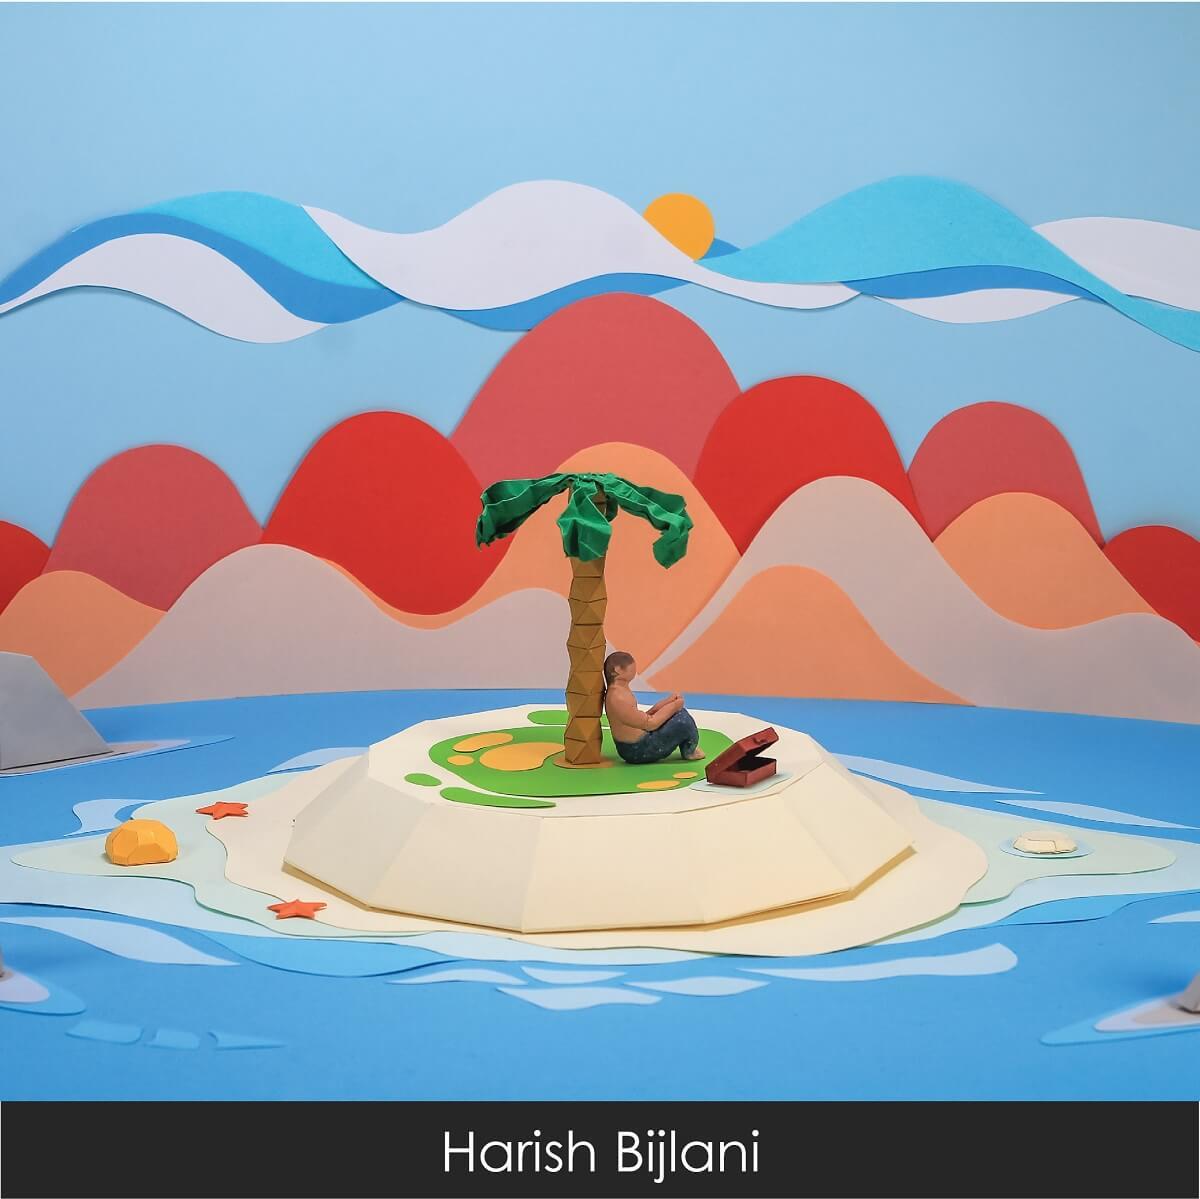 Student Work - Harish Bijlani